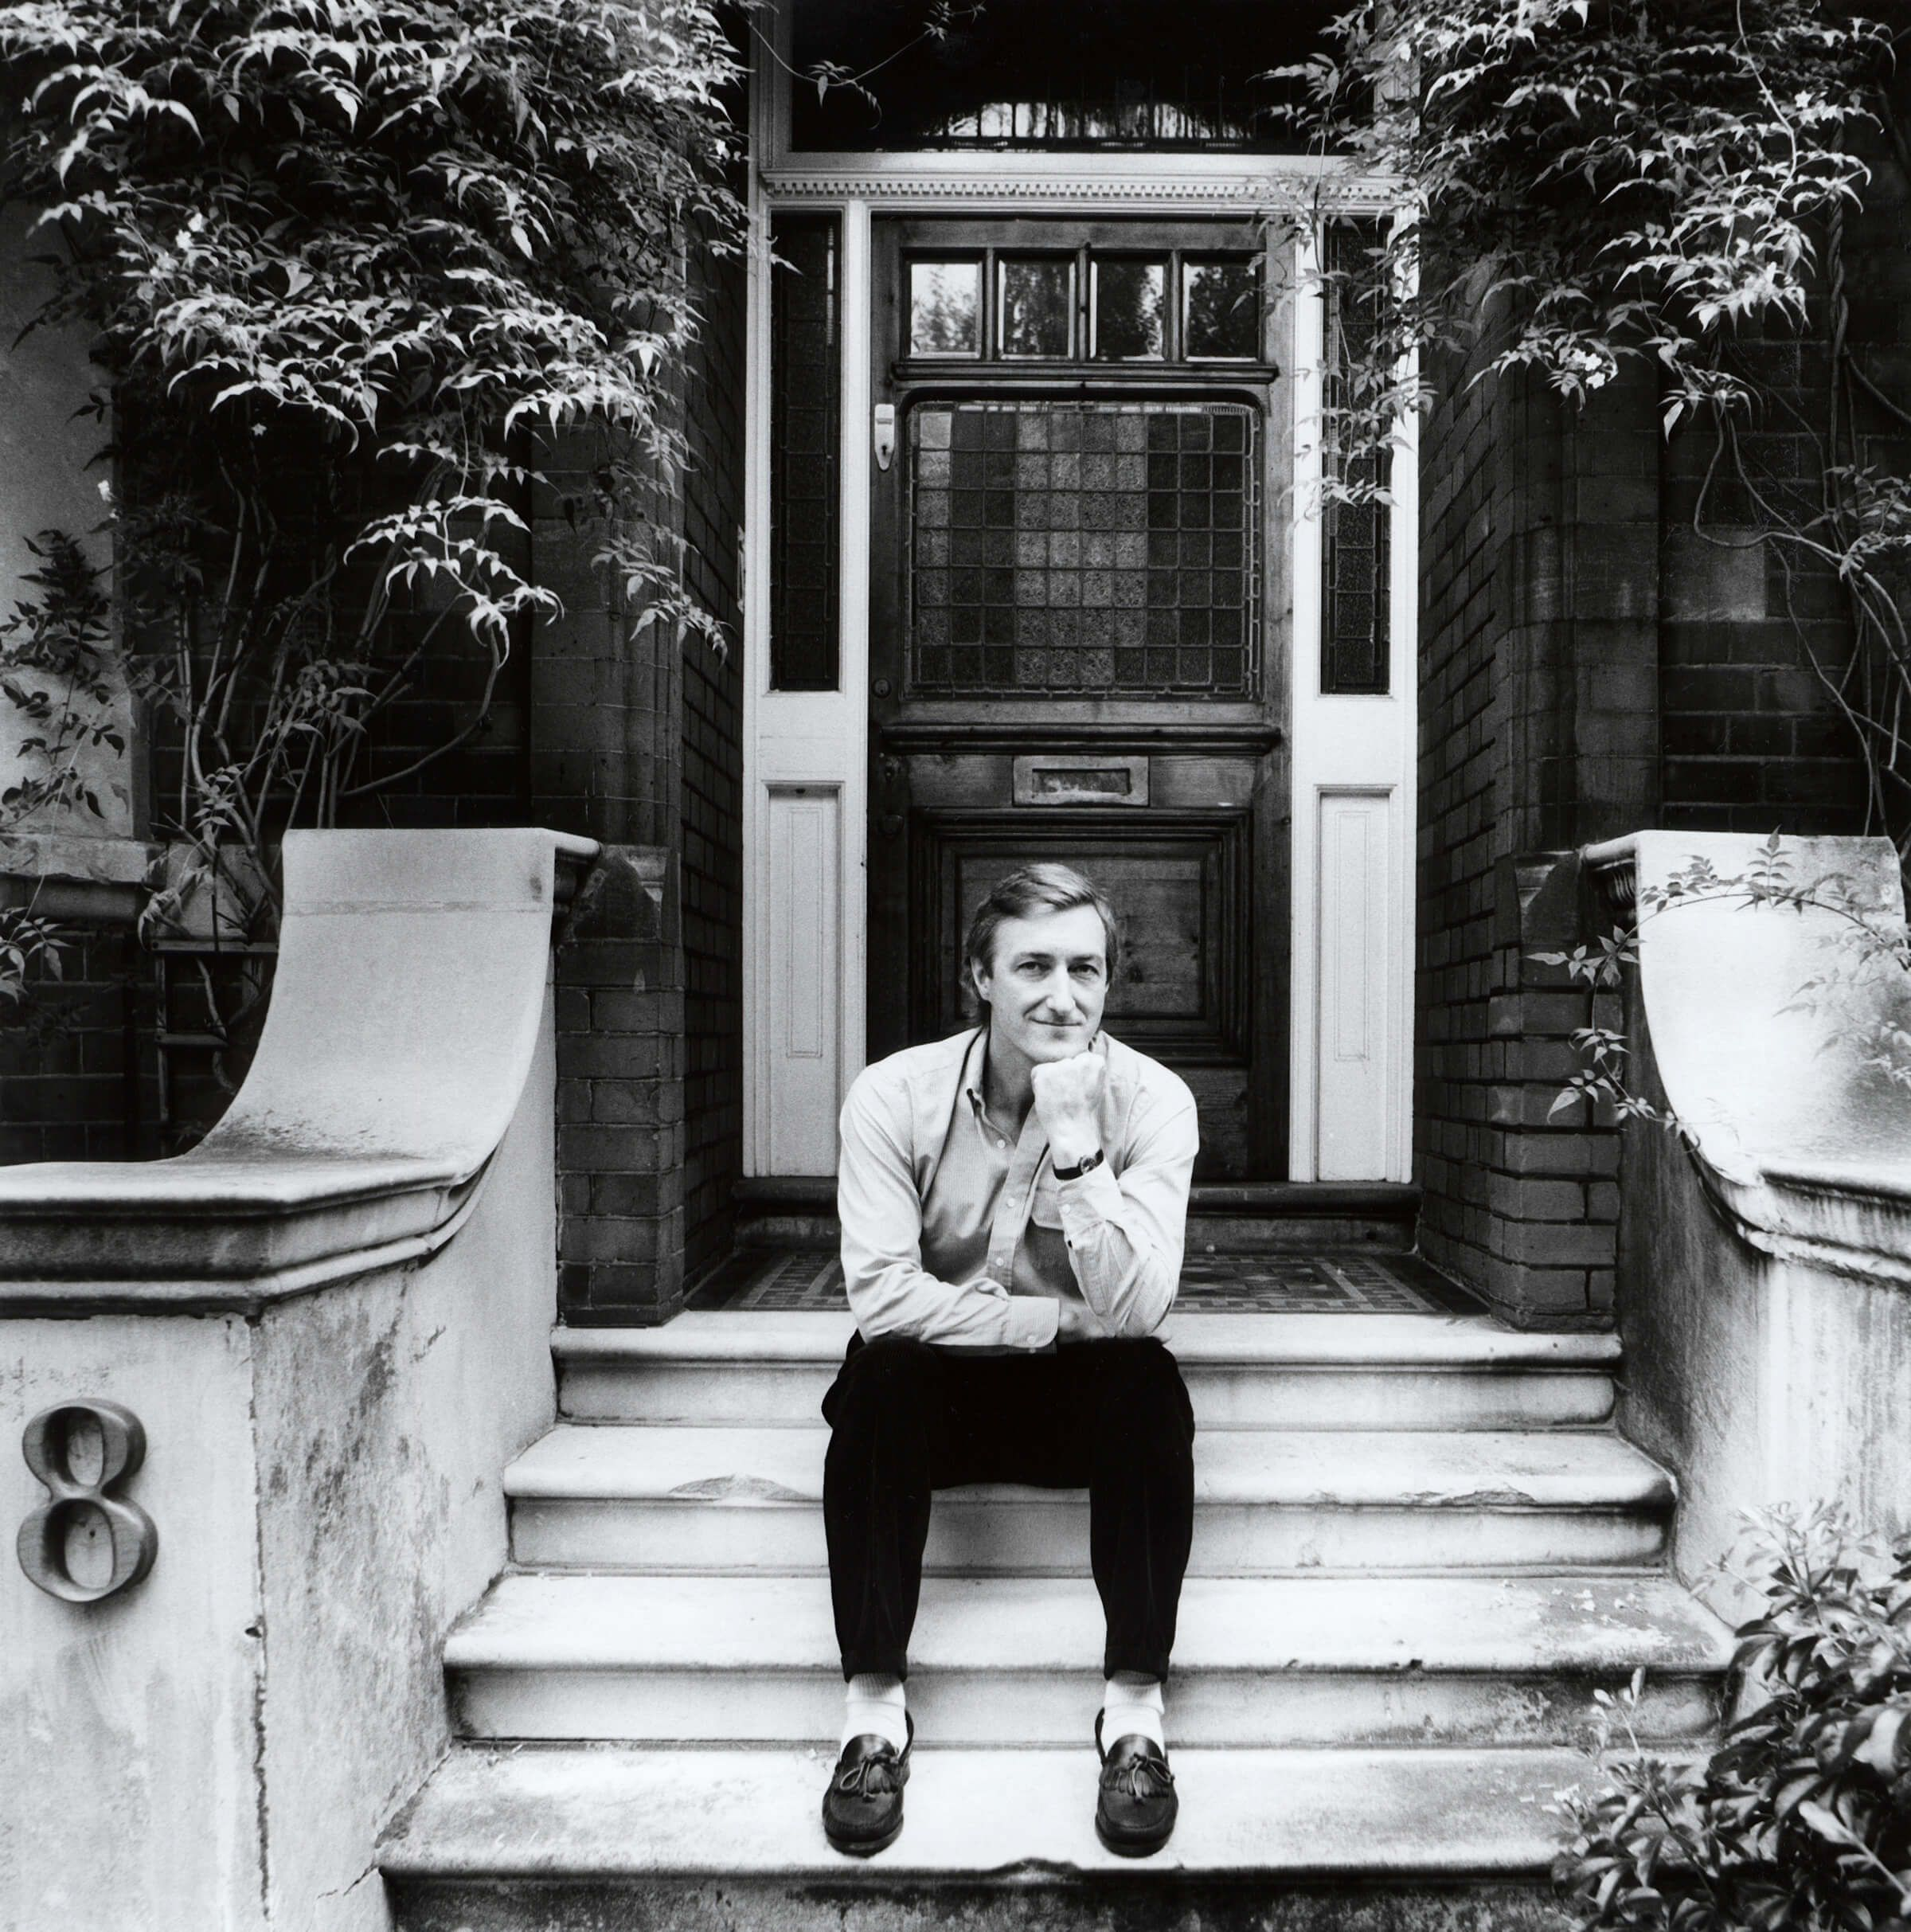 Джулиан Барнс в 1987 году. Фото: Stephen Hyde / npg.org.uk